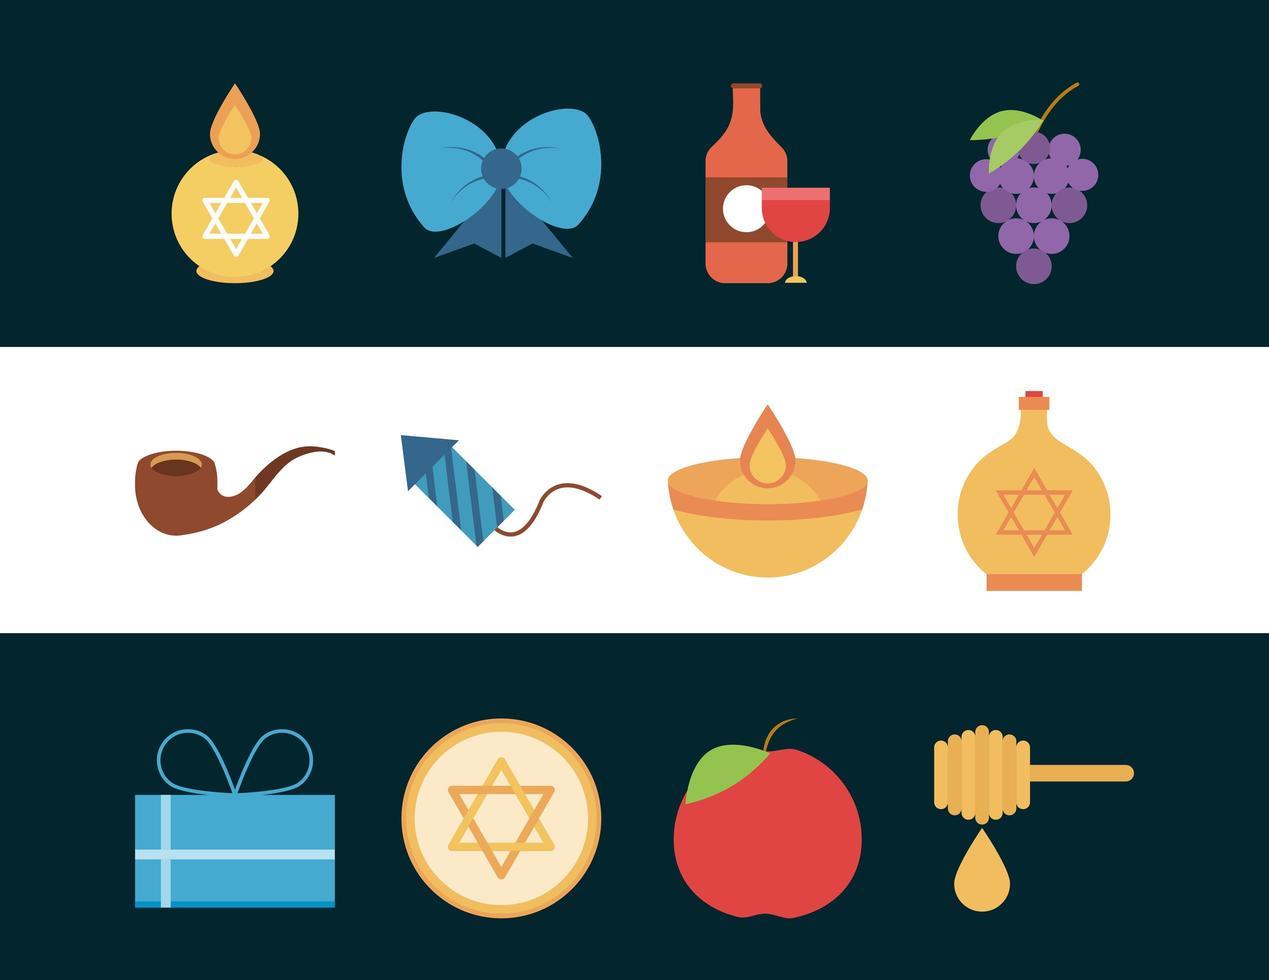 Chanoeka, Joodse traditionele ceremonie platte pictogramserie vector